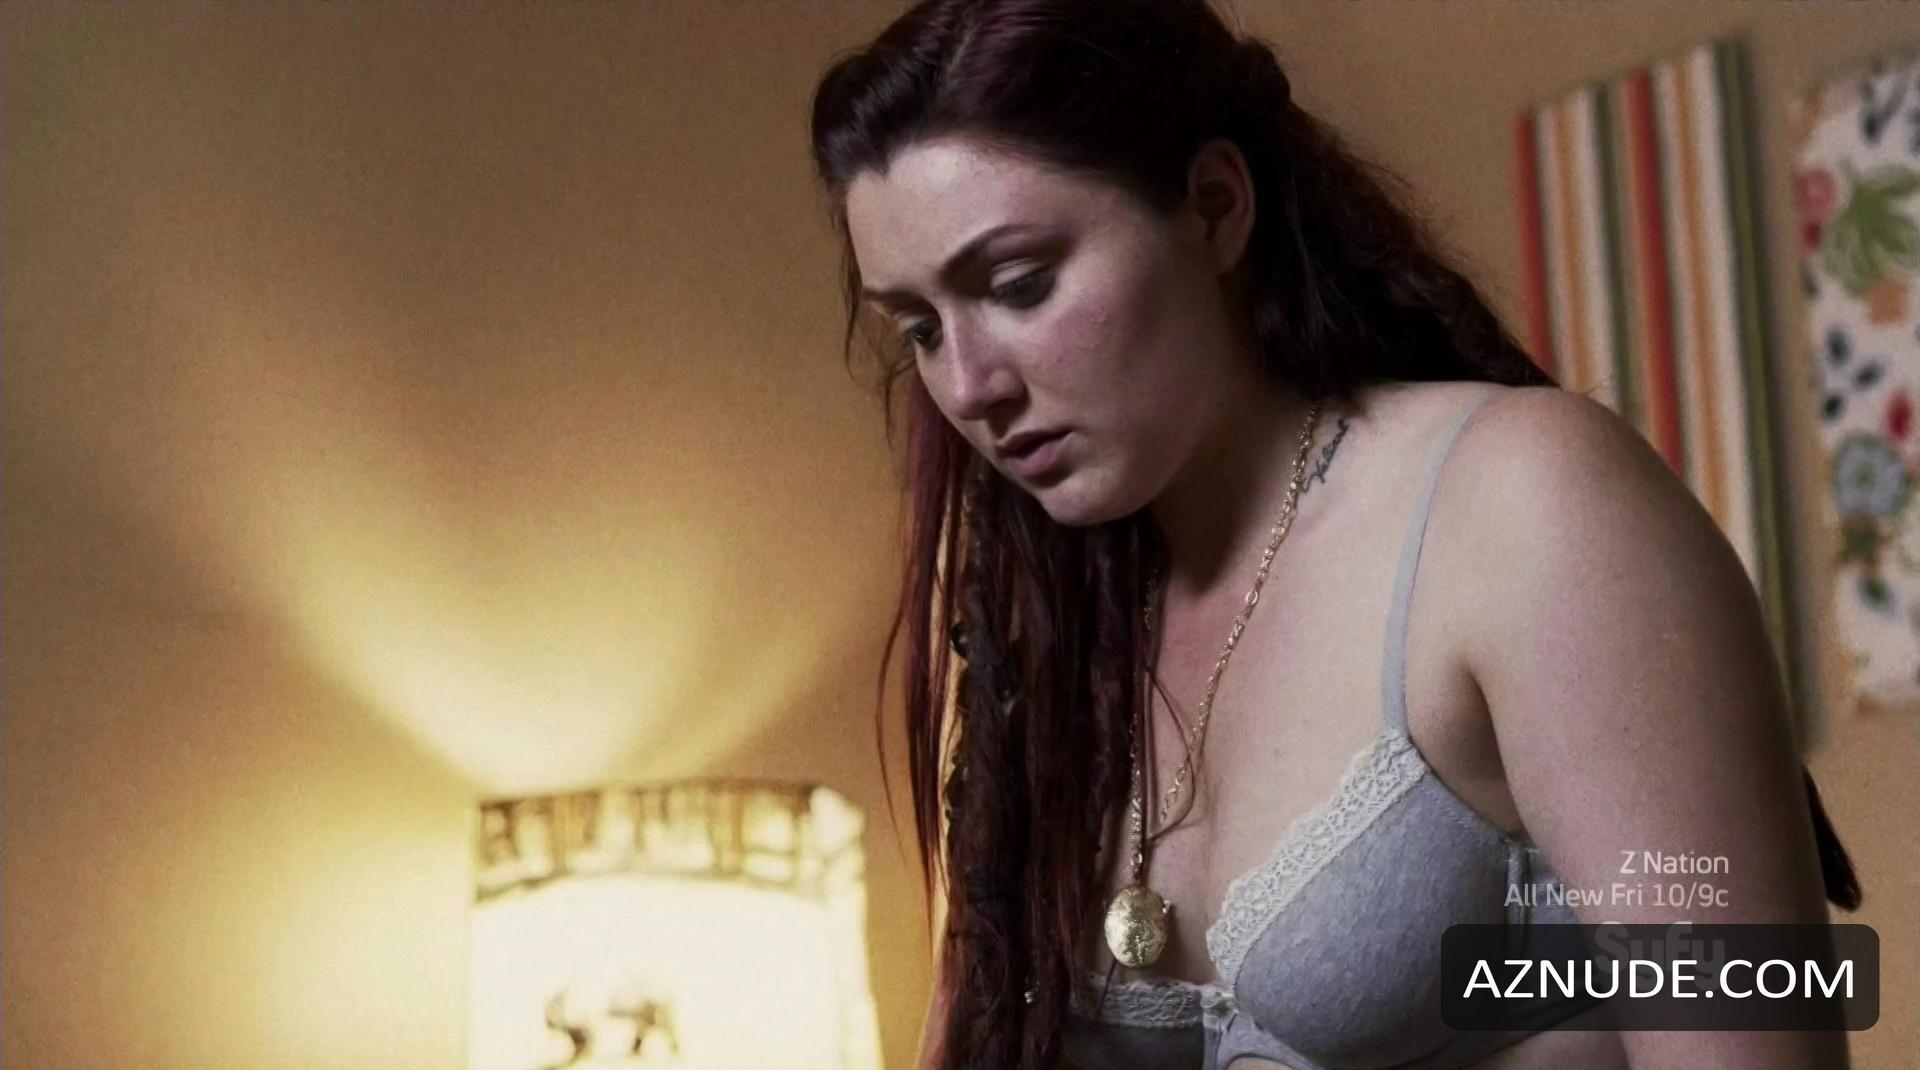 Debra wilson hard nipples - Porno photo